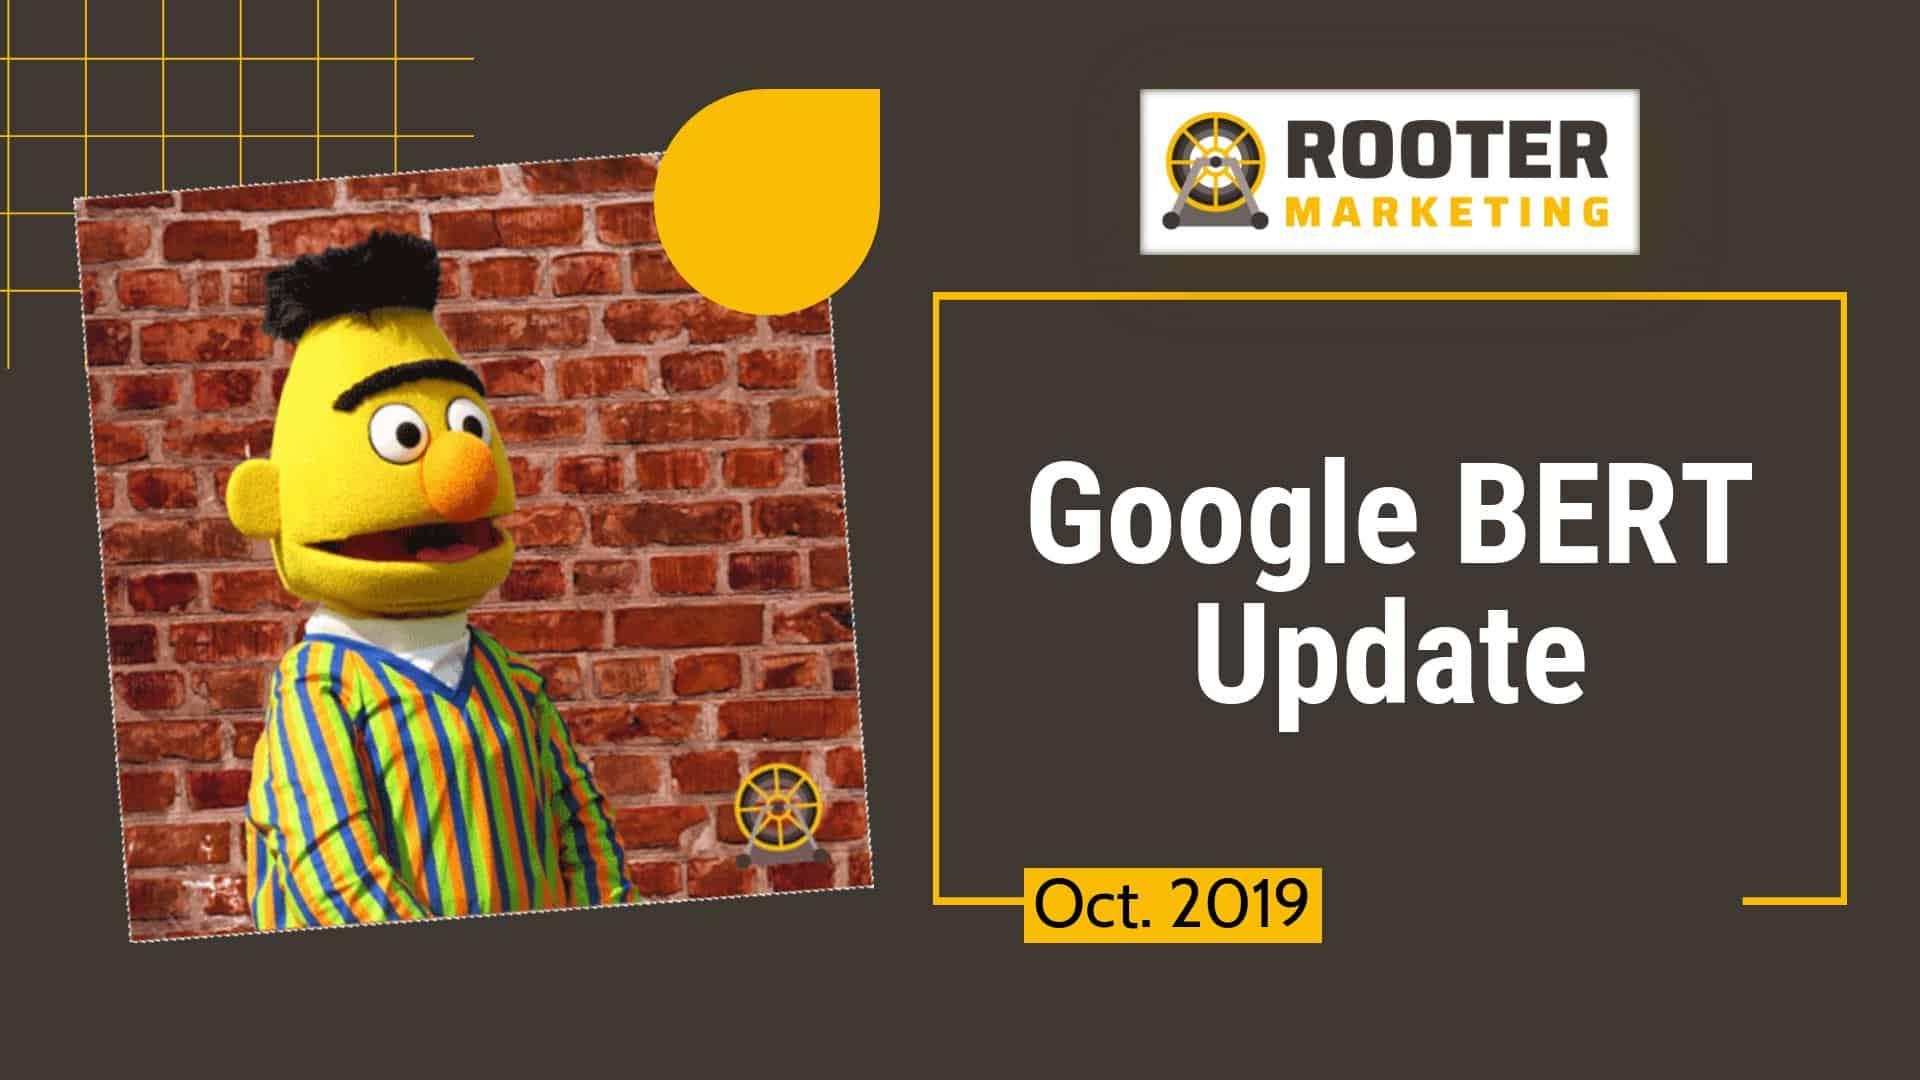 Google SEO BERT Update Rooter Marketing Plumbing SEO